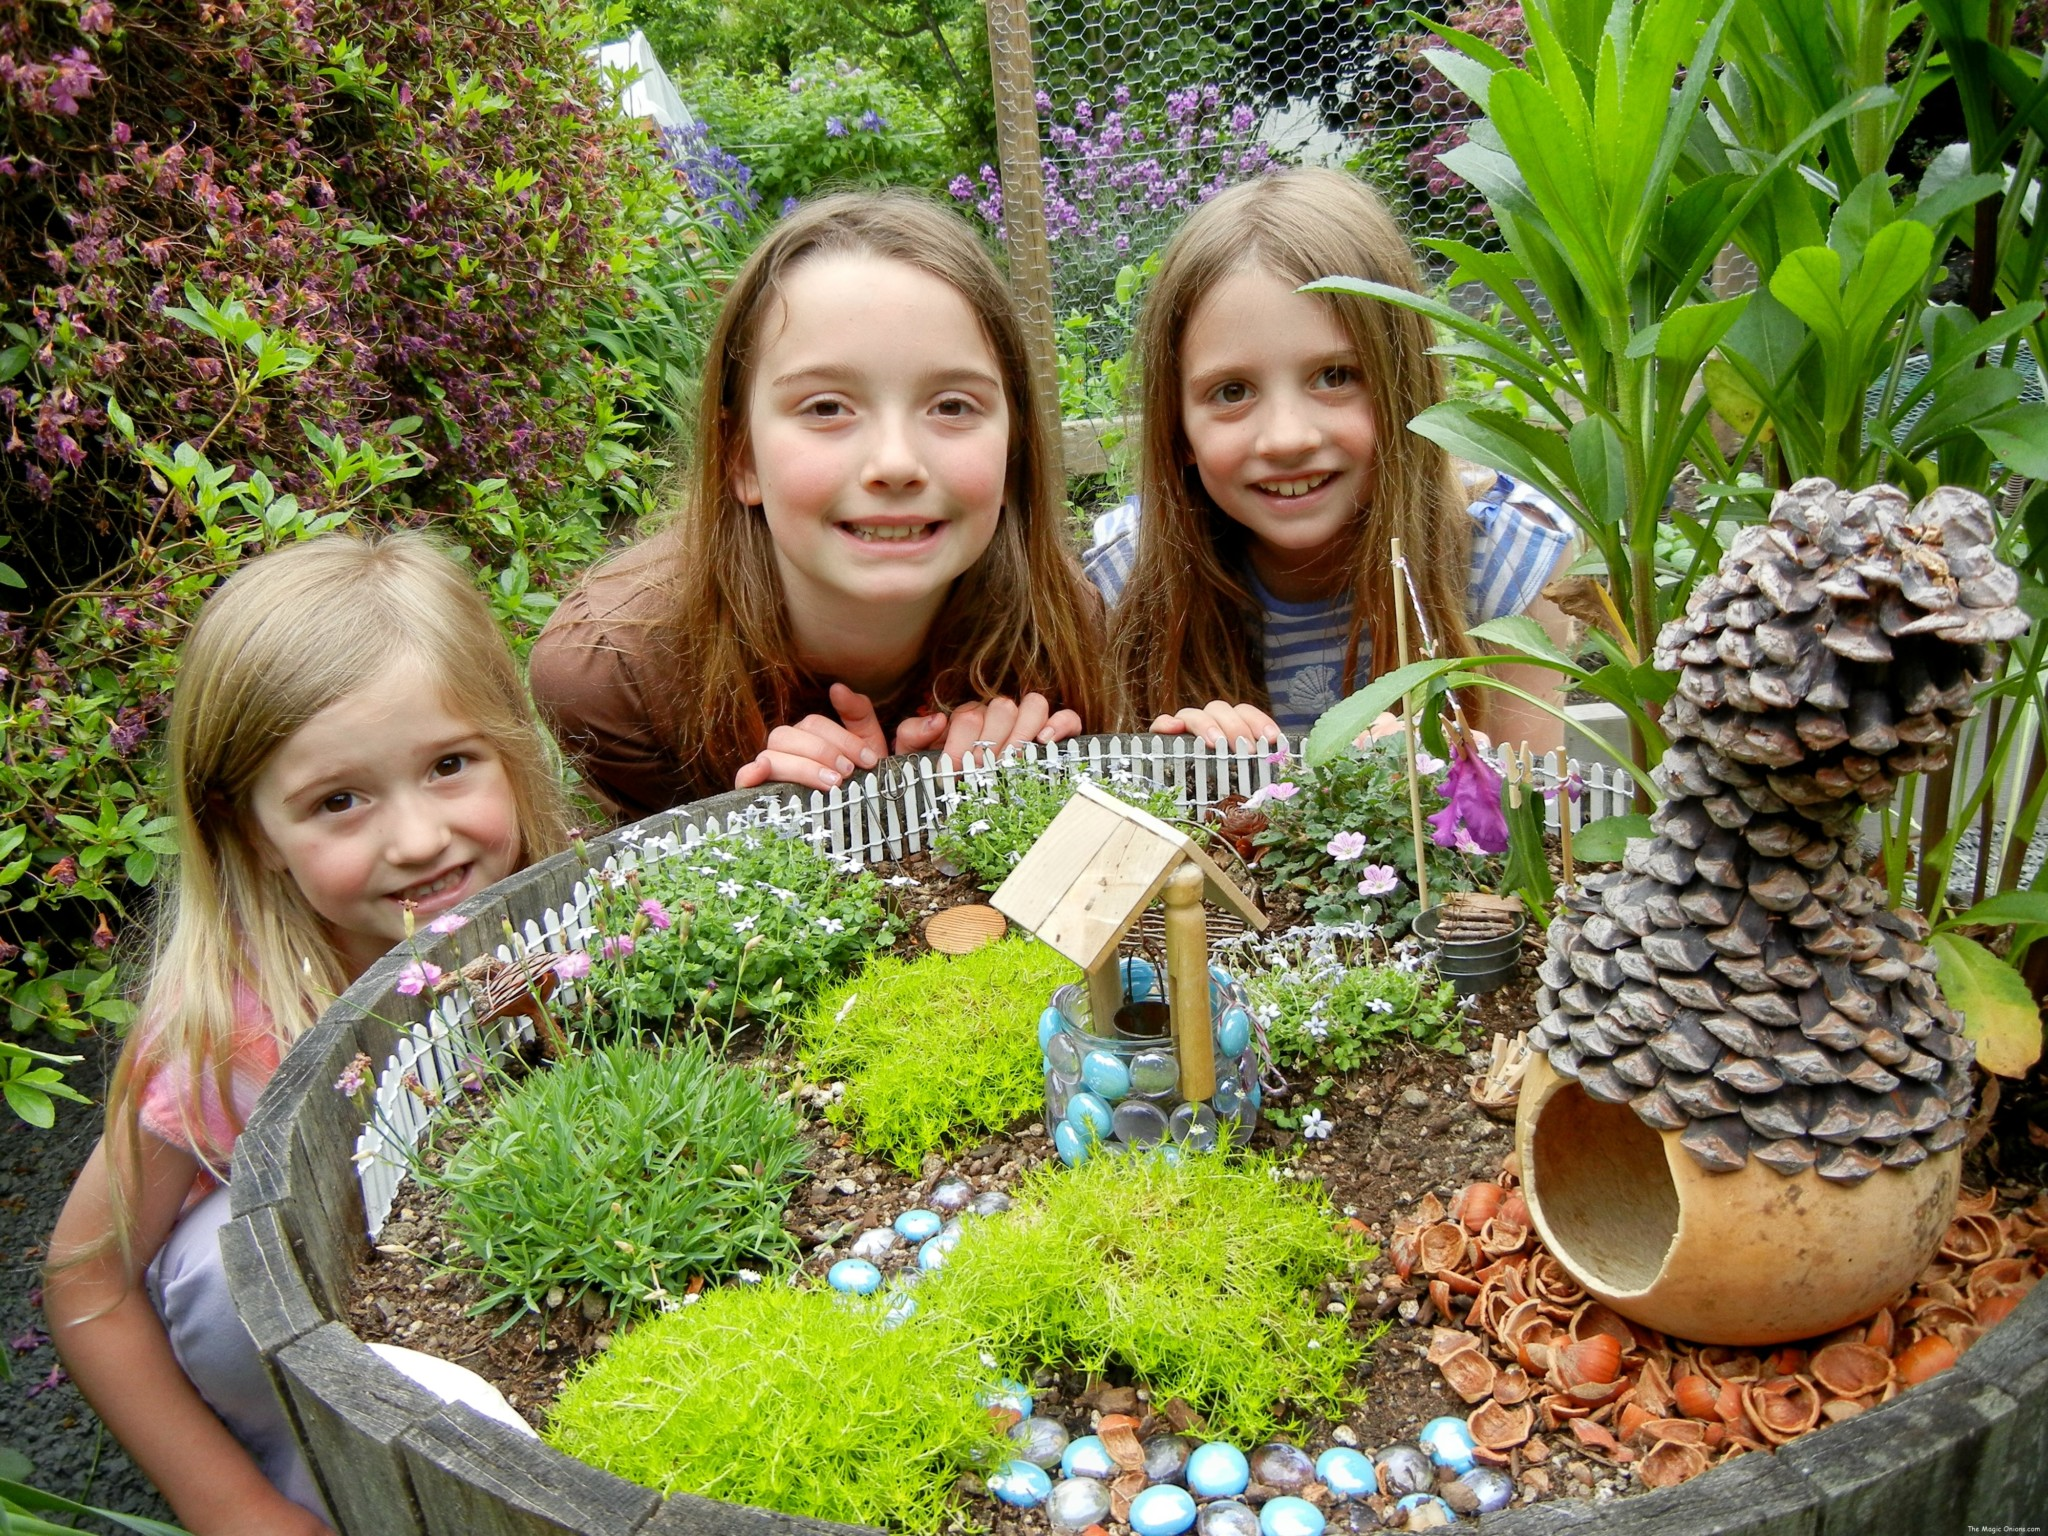 Fairy-Gardening-for-Kids-1024x768@2x.jpg